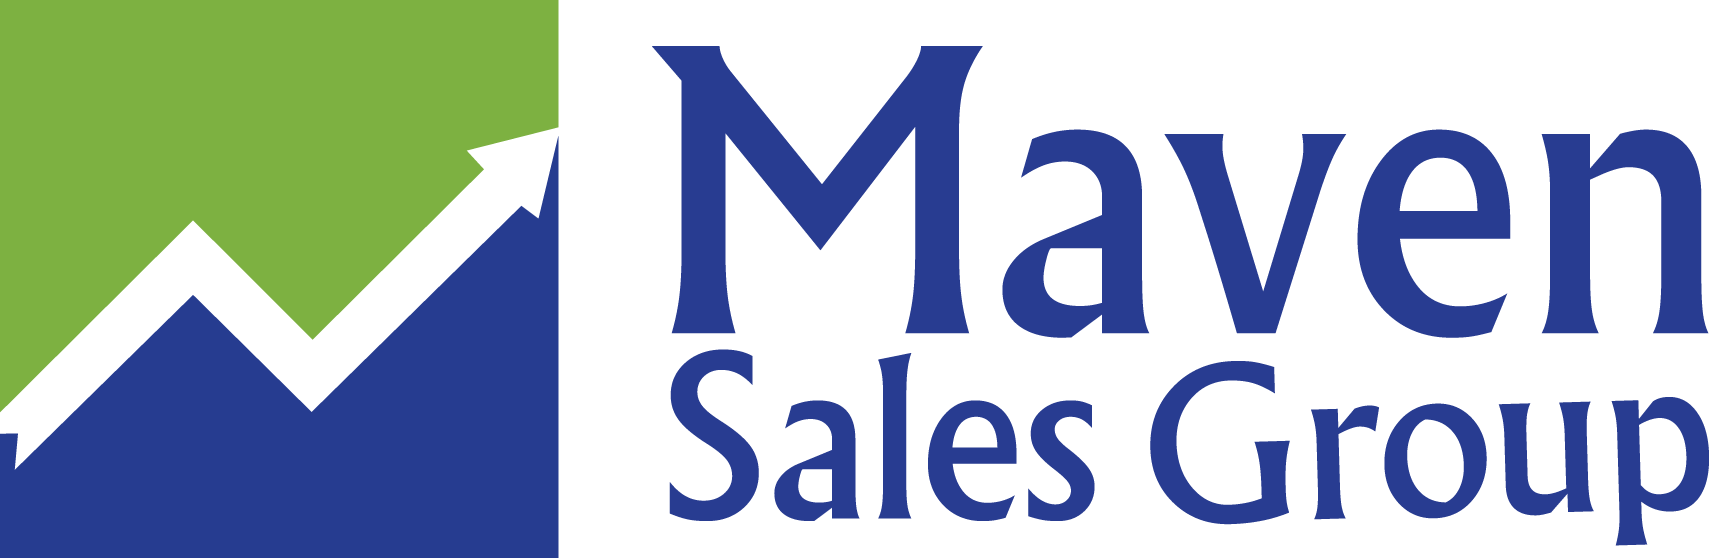 Copy of Maven Sales Group Logo_Horizontal.png